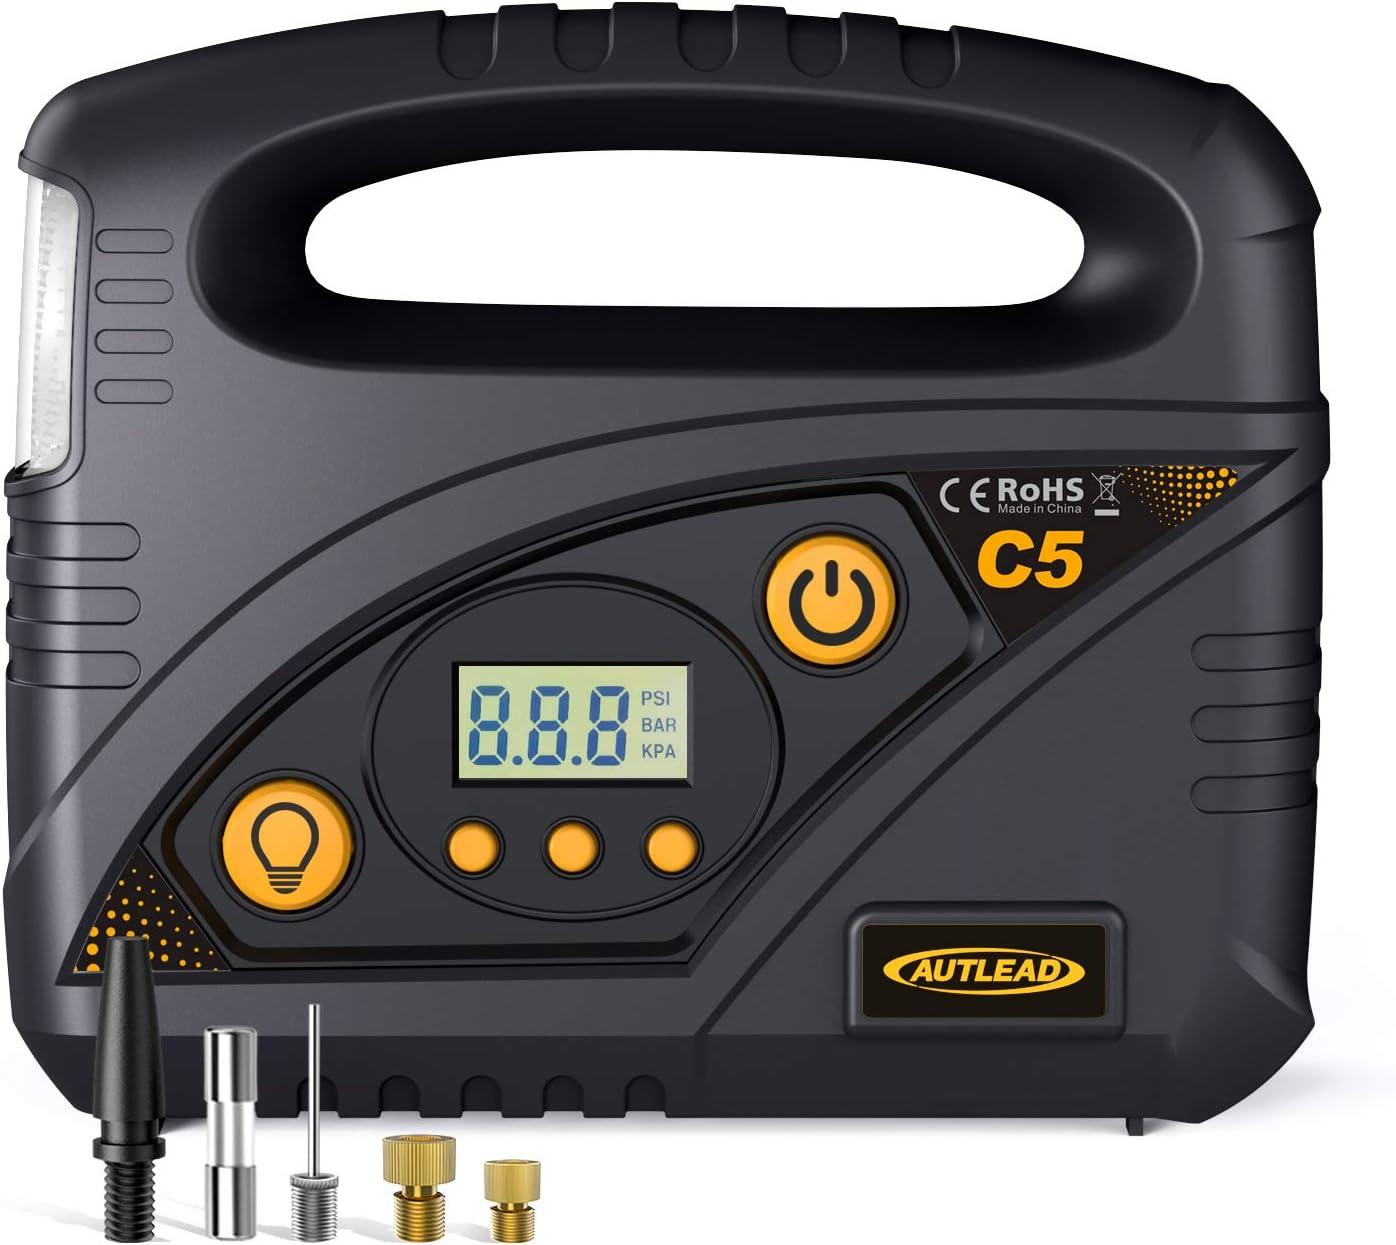 AUTLEAD C5 - Compresor Aire Coche, 12V Compresor de Aire Portátil, Compresor Ruedas Coche con Apagado Automático, Luz LED, Manómetro, 4 Adaptadores de Boquilla